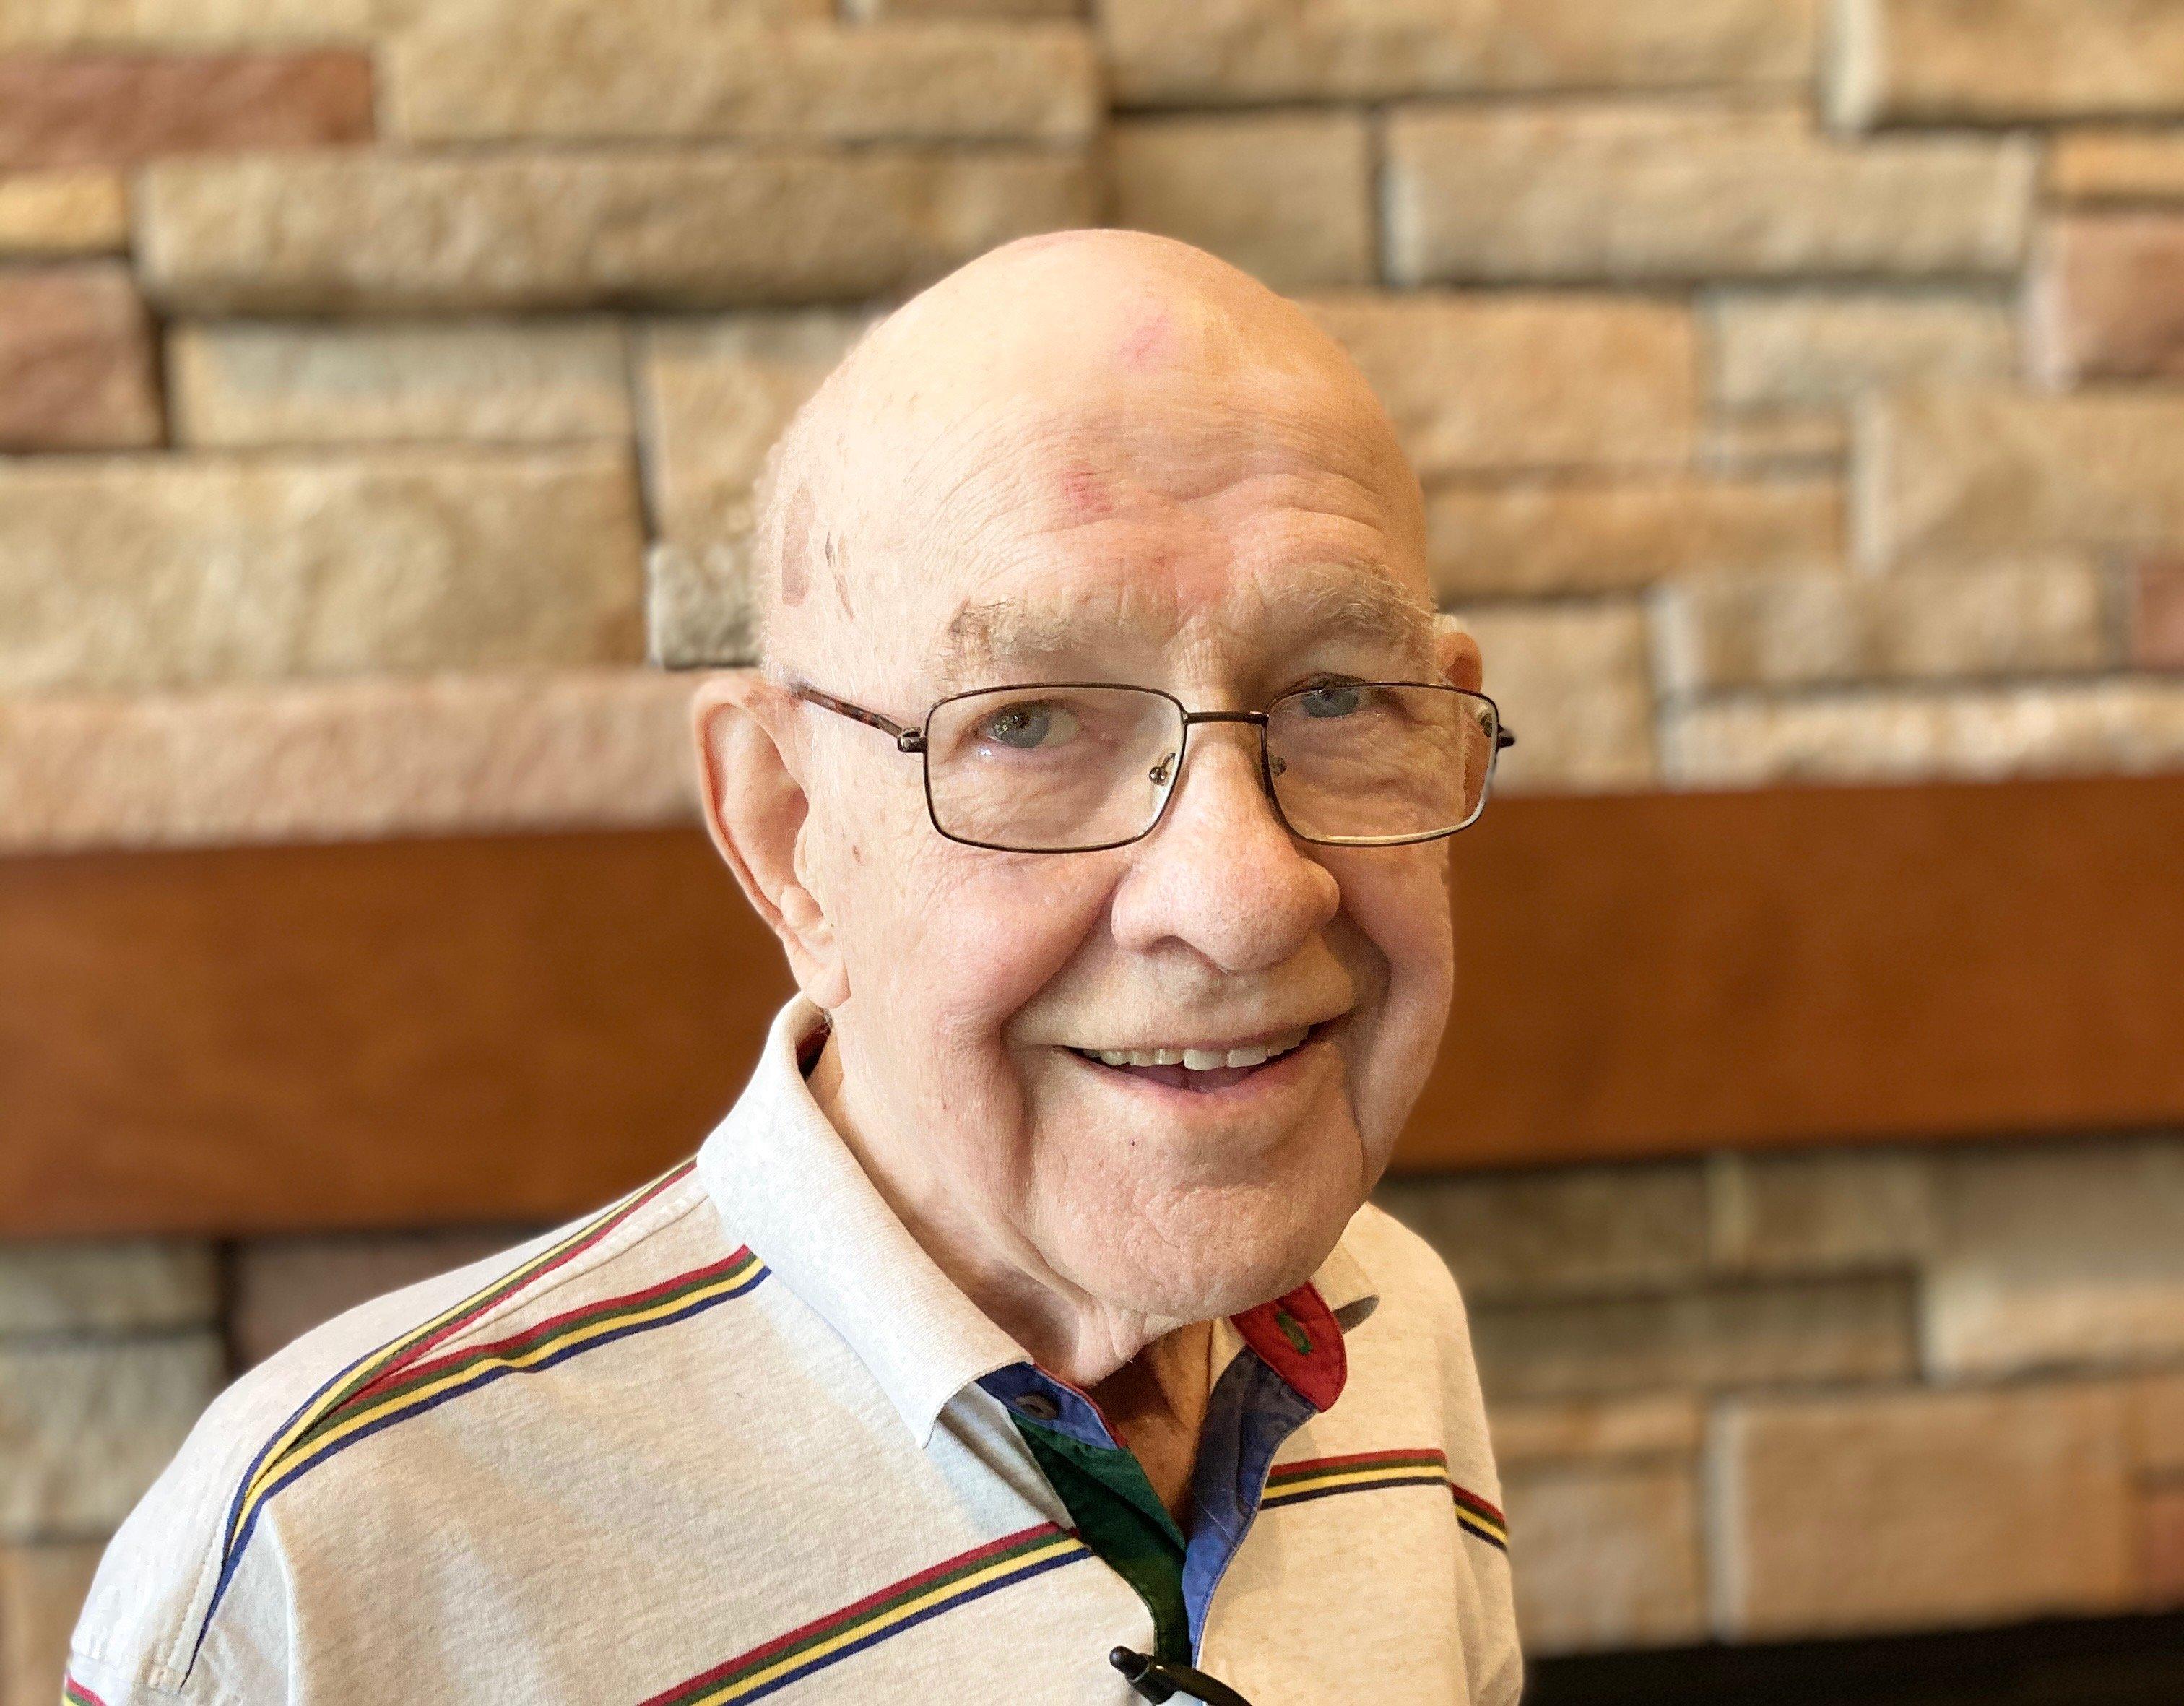 Meet the man behind the Hobey Baker award: Chuck Bard